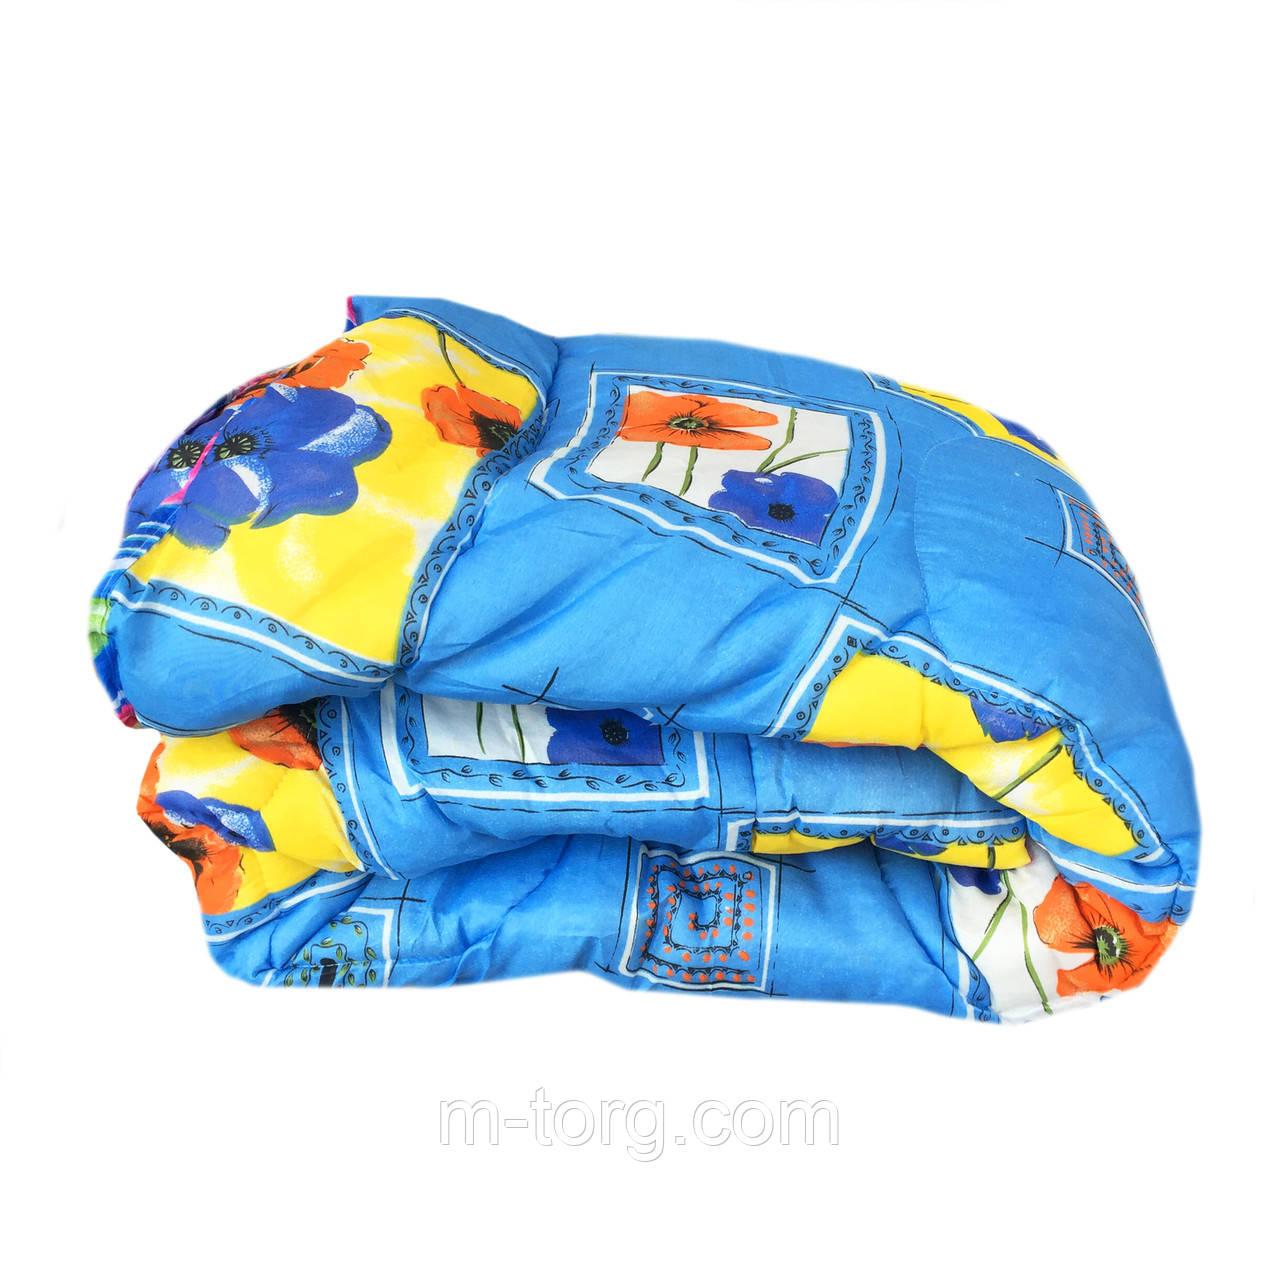 Одеяло евро размер холлофайбер, ткань поликоттон бязь